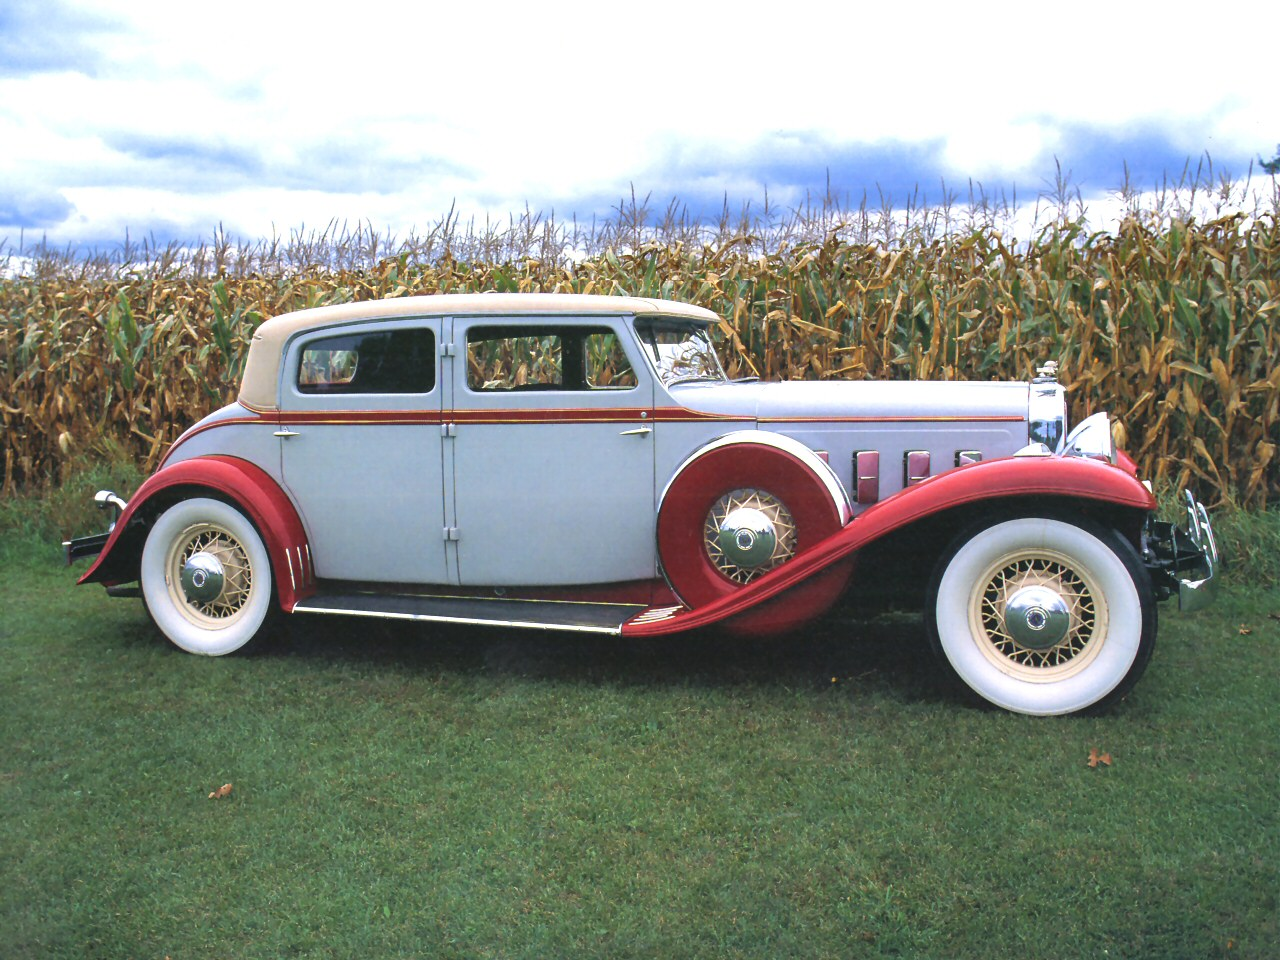 1930 Stutz Monte Marlo 4 Door Sedan Light Blue Red Svr